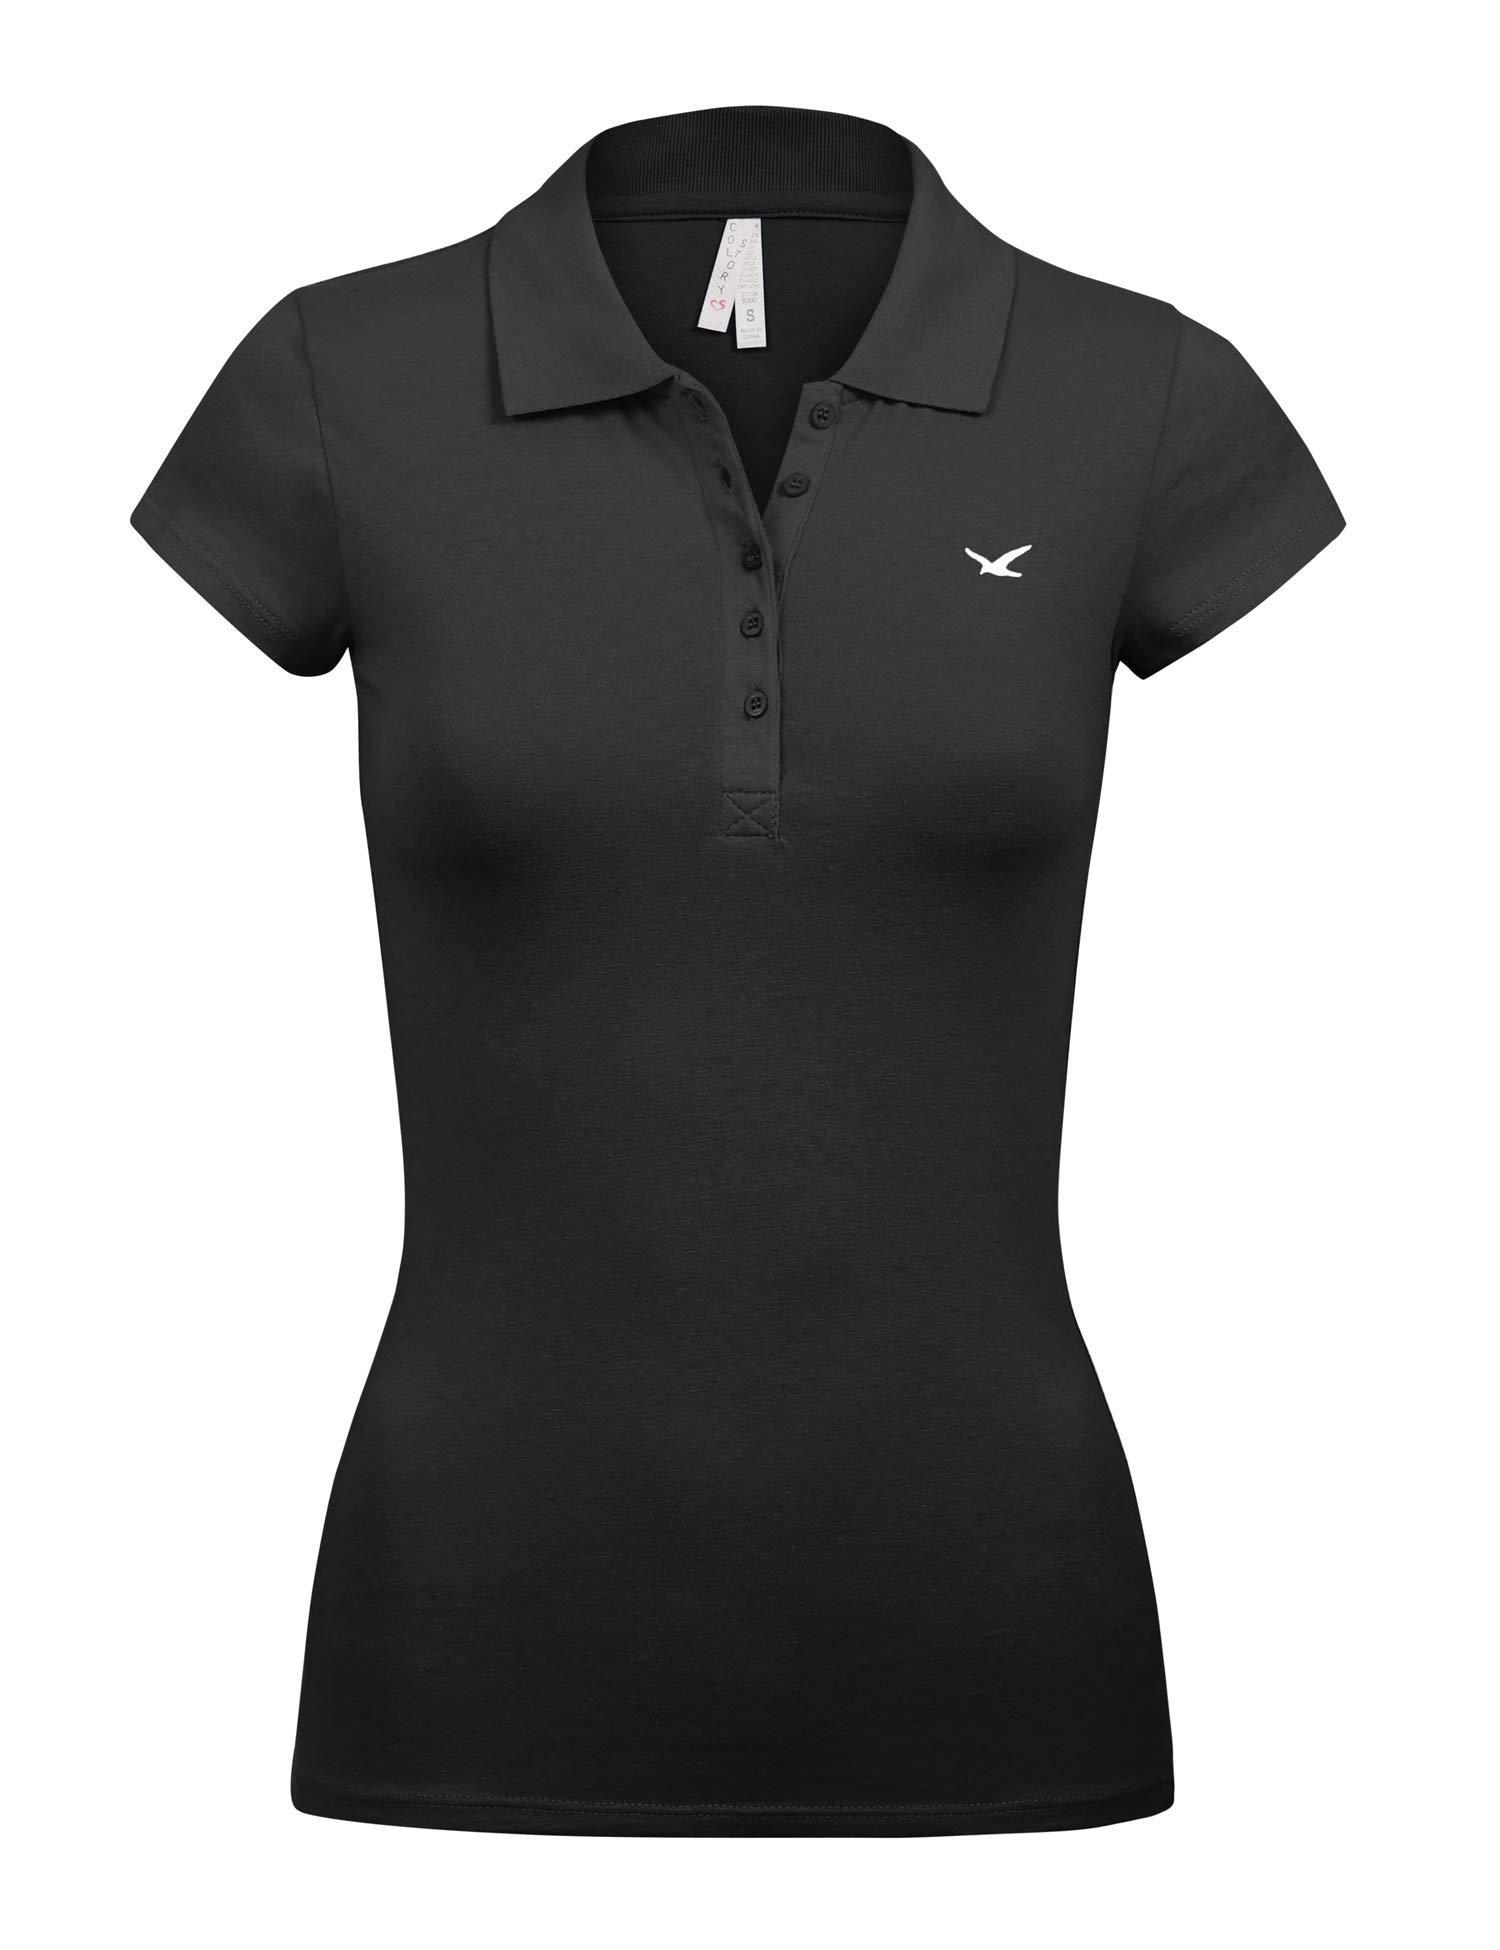 Women's Short Sleeve Black Color 5 Buttons Slim Fit Polo Shirts(3000-BLACK-L)